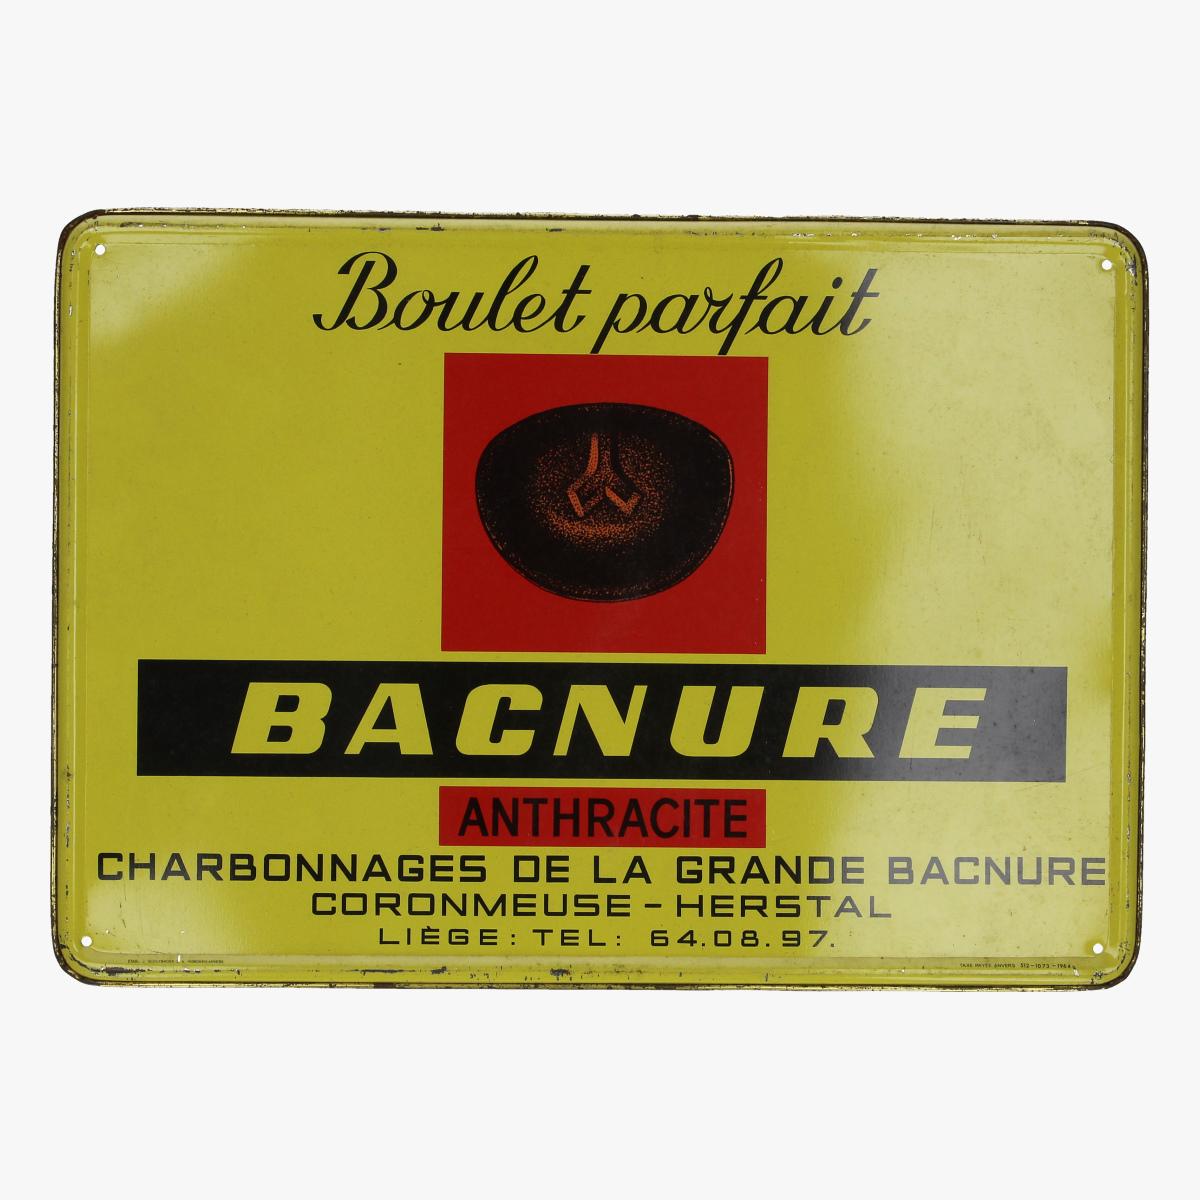 Afbeeldingen van blikken reclame bordje 1964 Boulet parfait BACNURE ANTHRACITE  TAX PAYEE ANVERS 512_1073